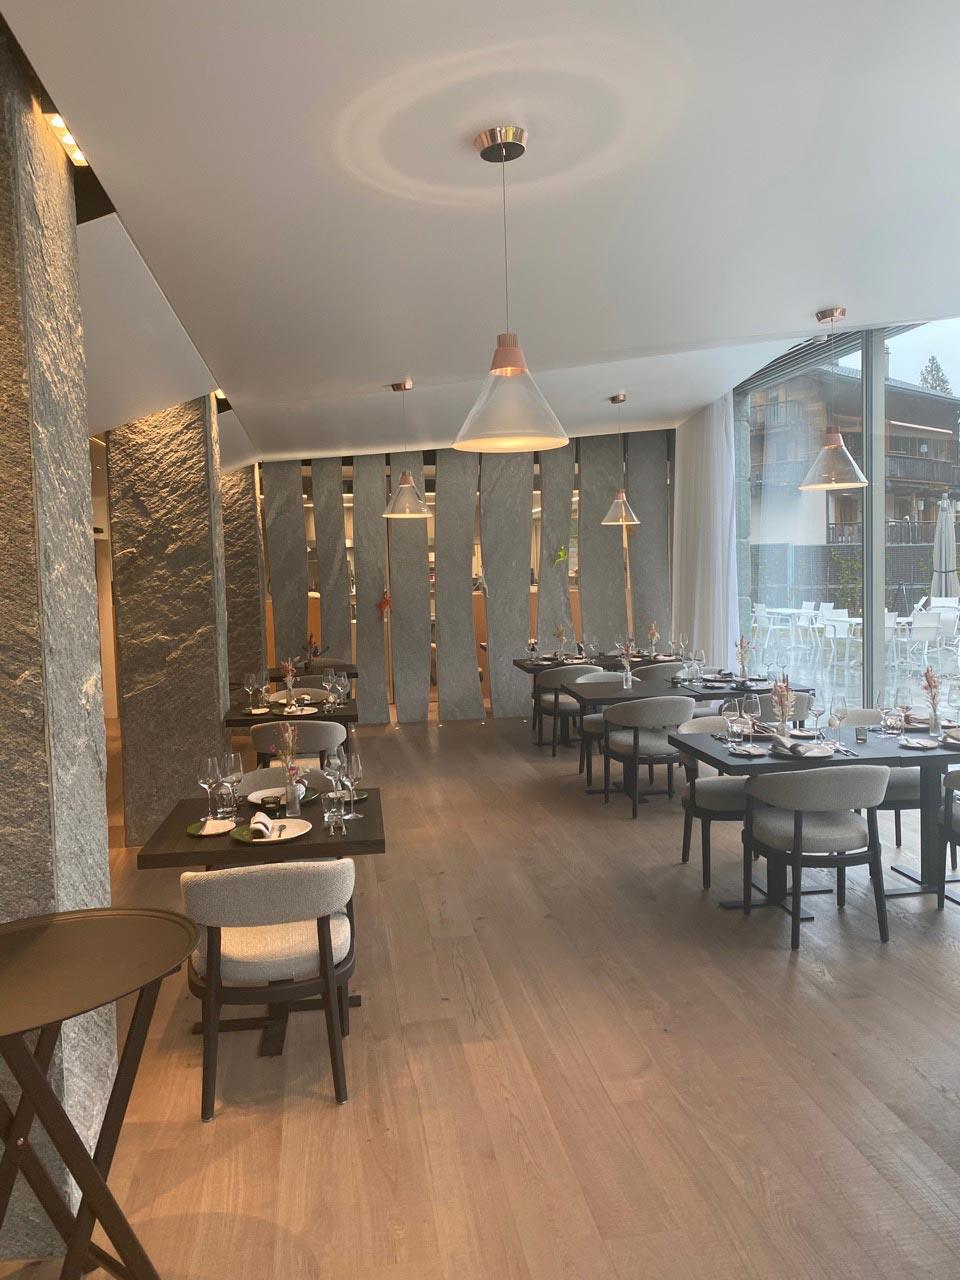 ES Aca 5760 restaurant vtc 20 08 006 - Restaurant le 1465 du Club Alpin